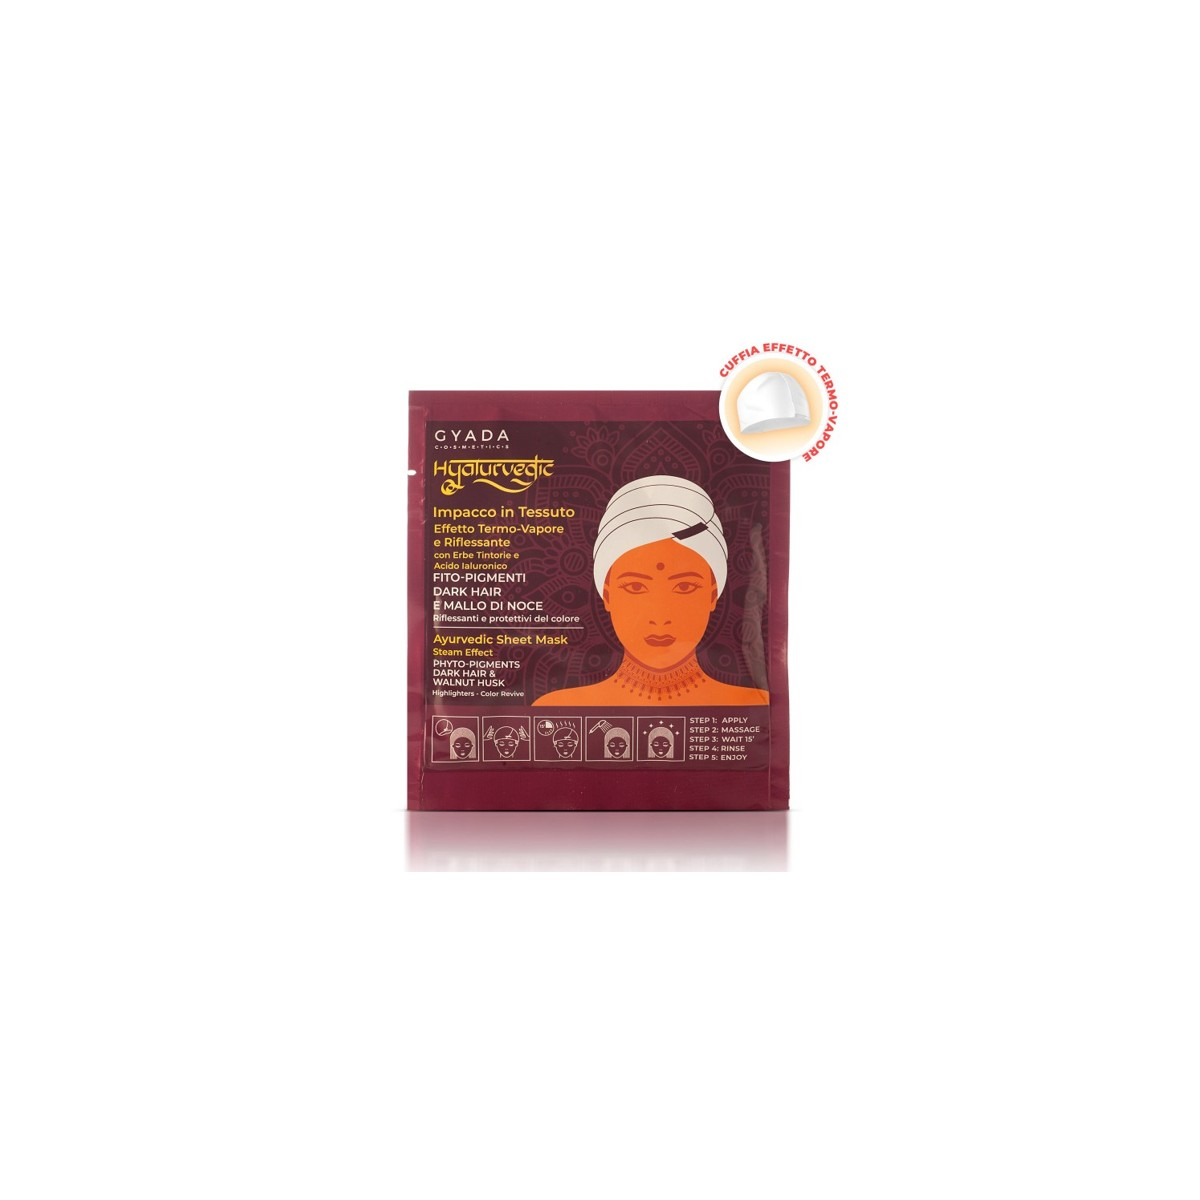 Hyalurvedic Dark Hair Colour Shine Mask